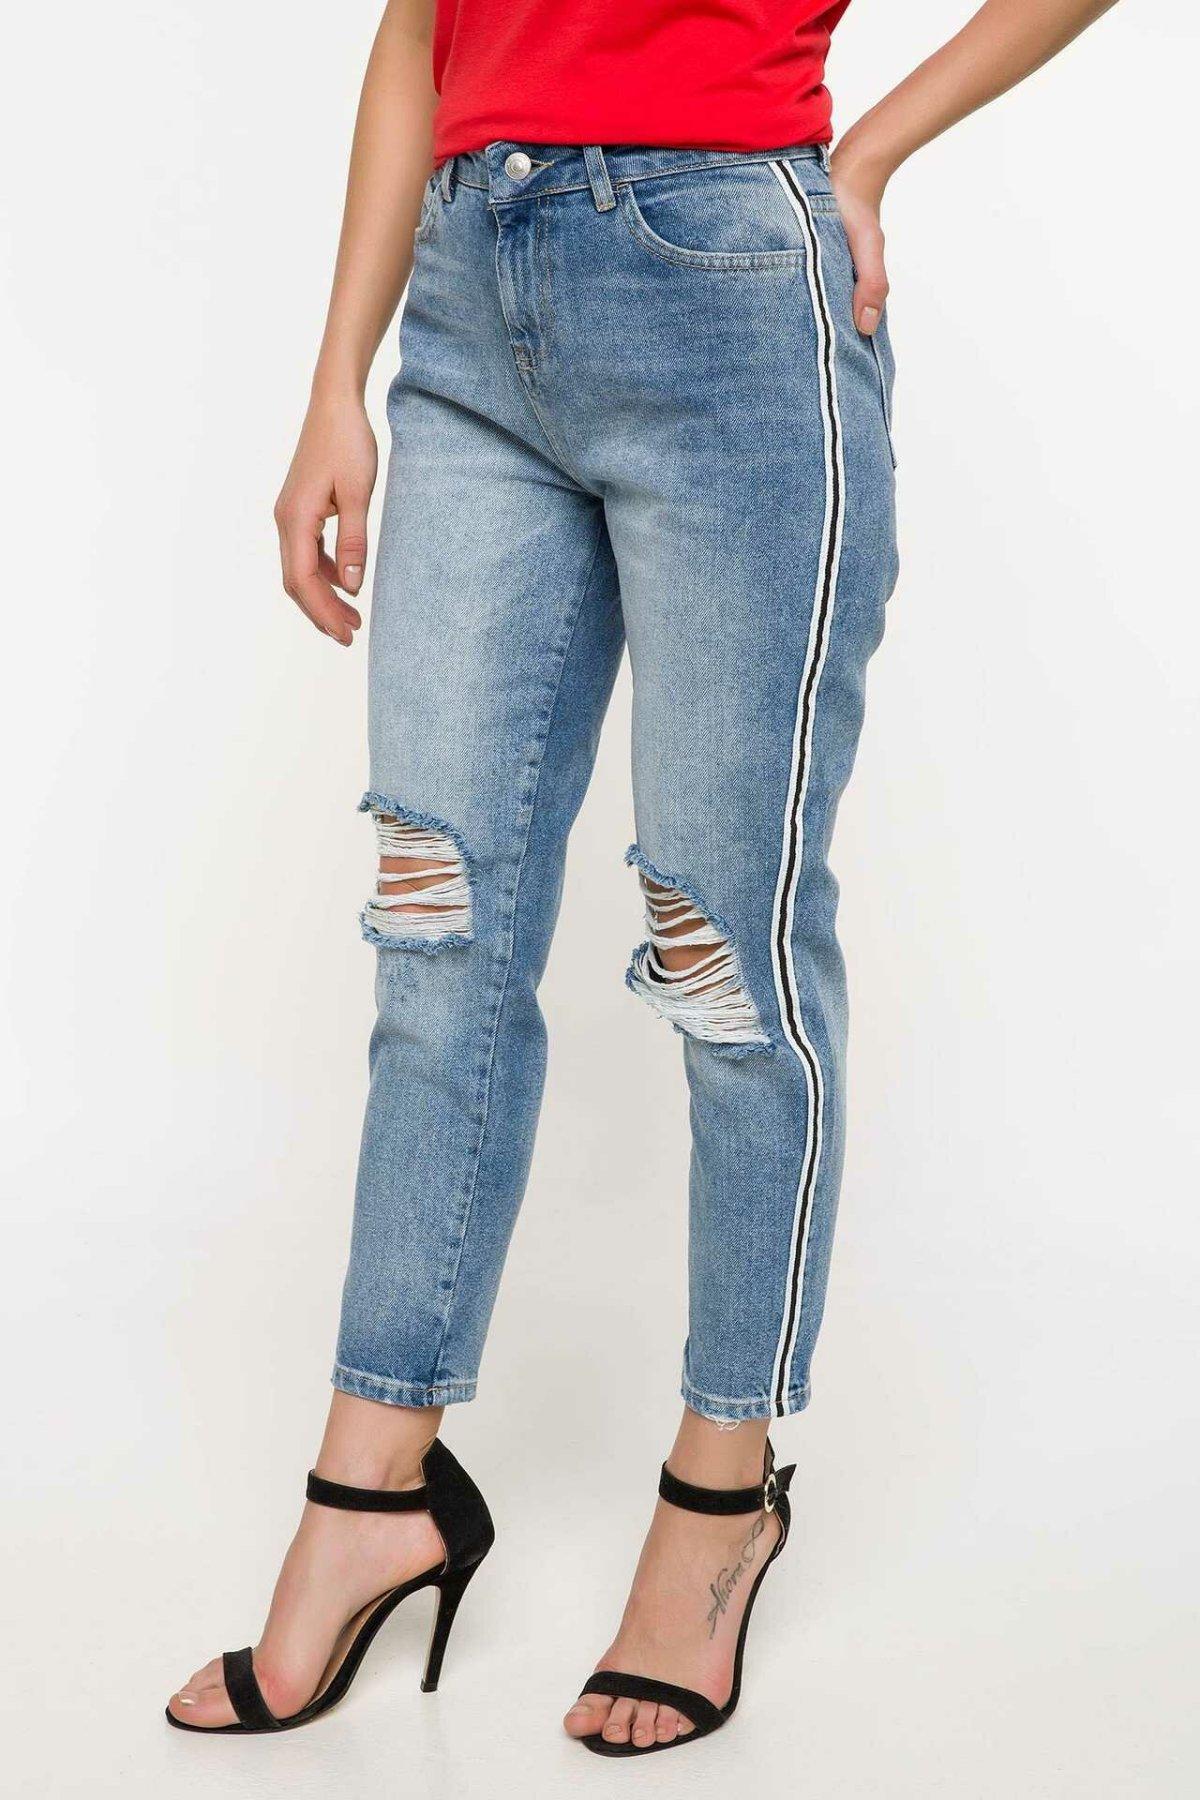 DeFacto Blue Women Worn Hole Loose Jeans Denim High-waist Denim Stretch Casual Denim Pencil Nine Minutes Trousers-J2015AZ18SM